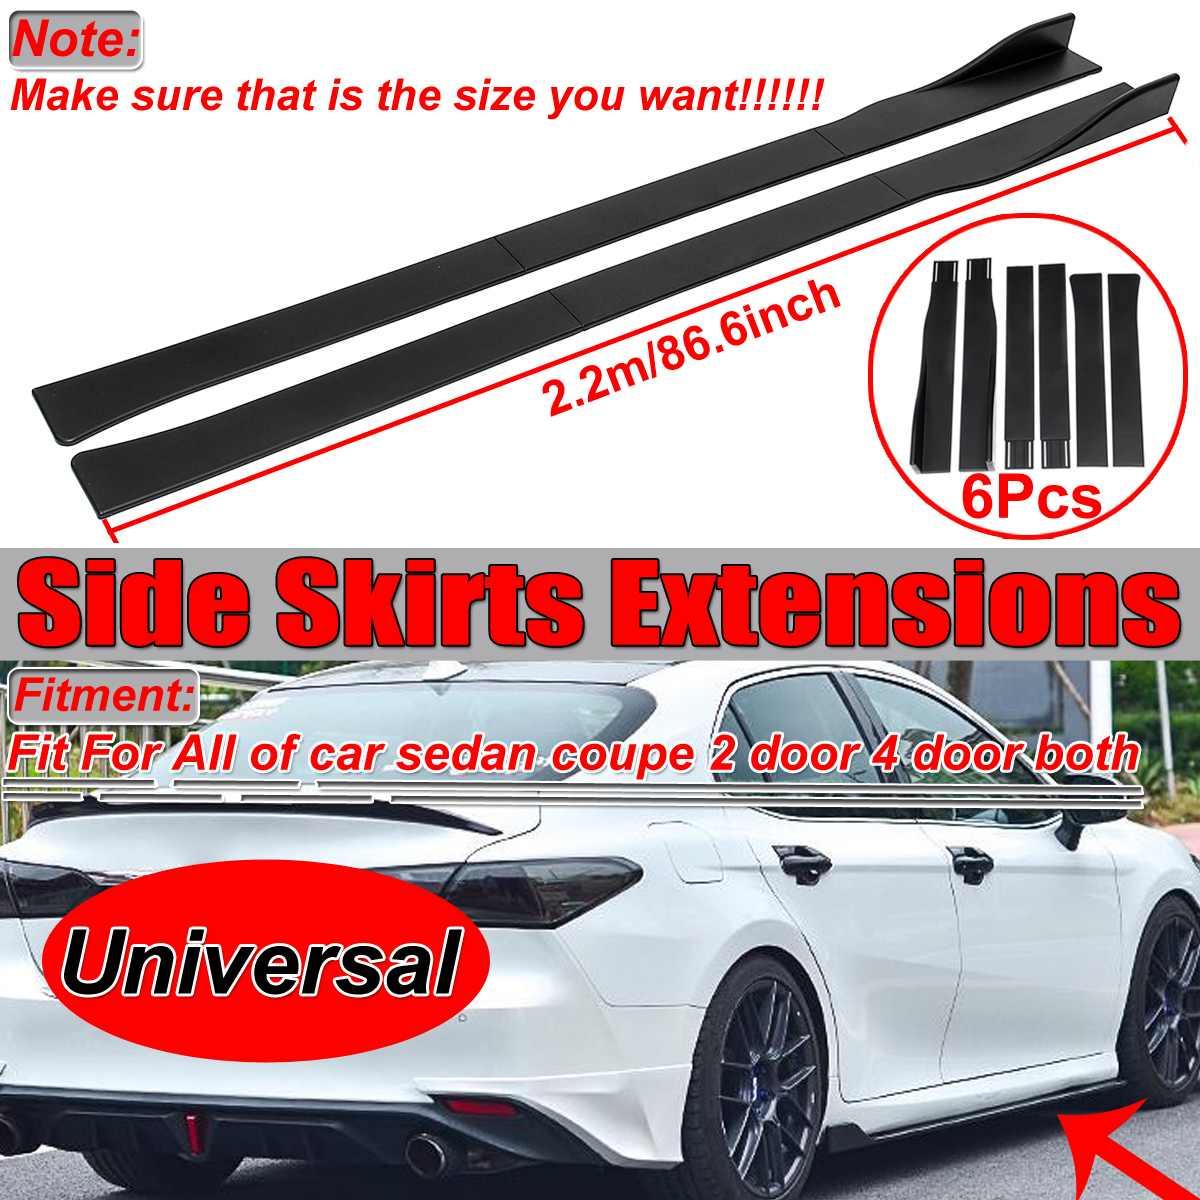 10x pare-chocs en plastique Grill Clip Bordure Rivet pour Honda Civic CRV Accord Integra HRV